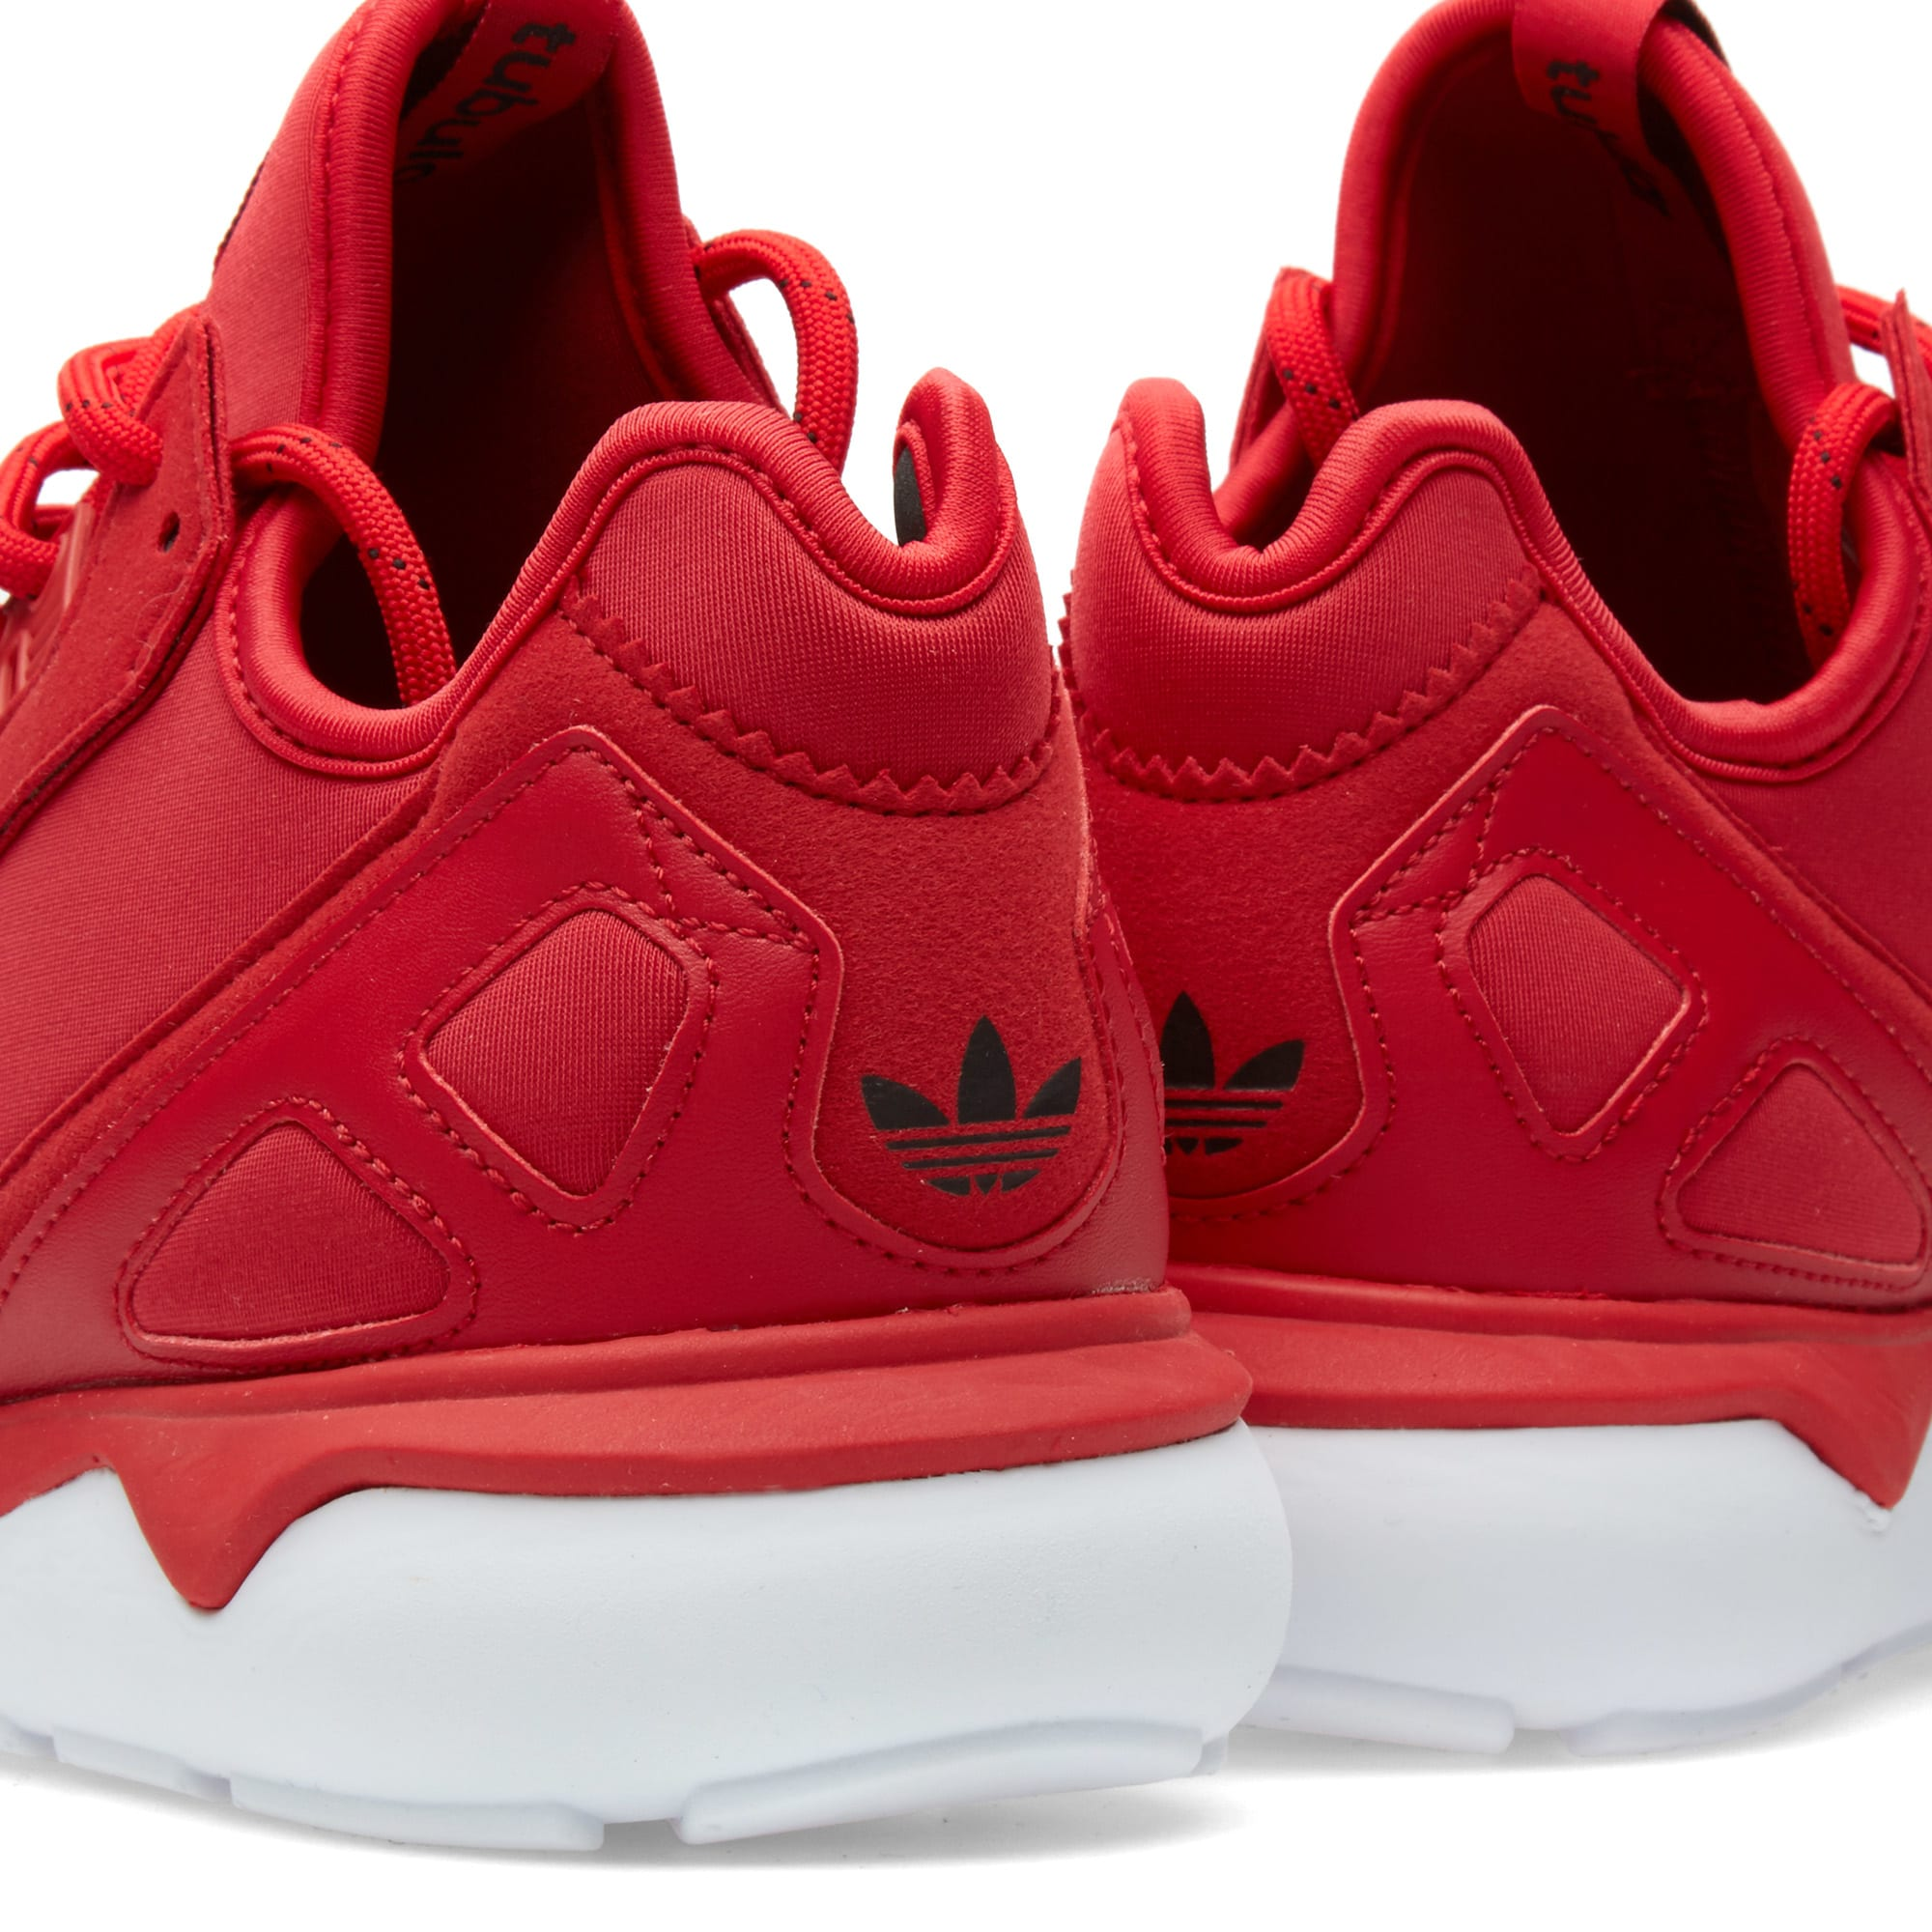 huge discount 90d42 b59f2 Adidas Tubular Runner